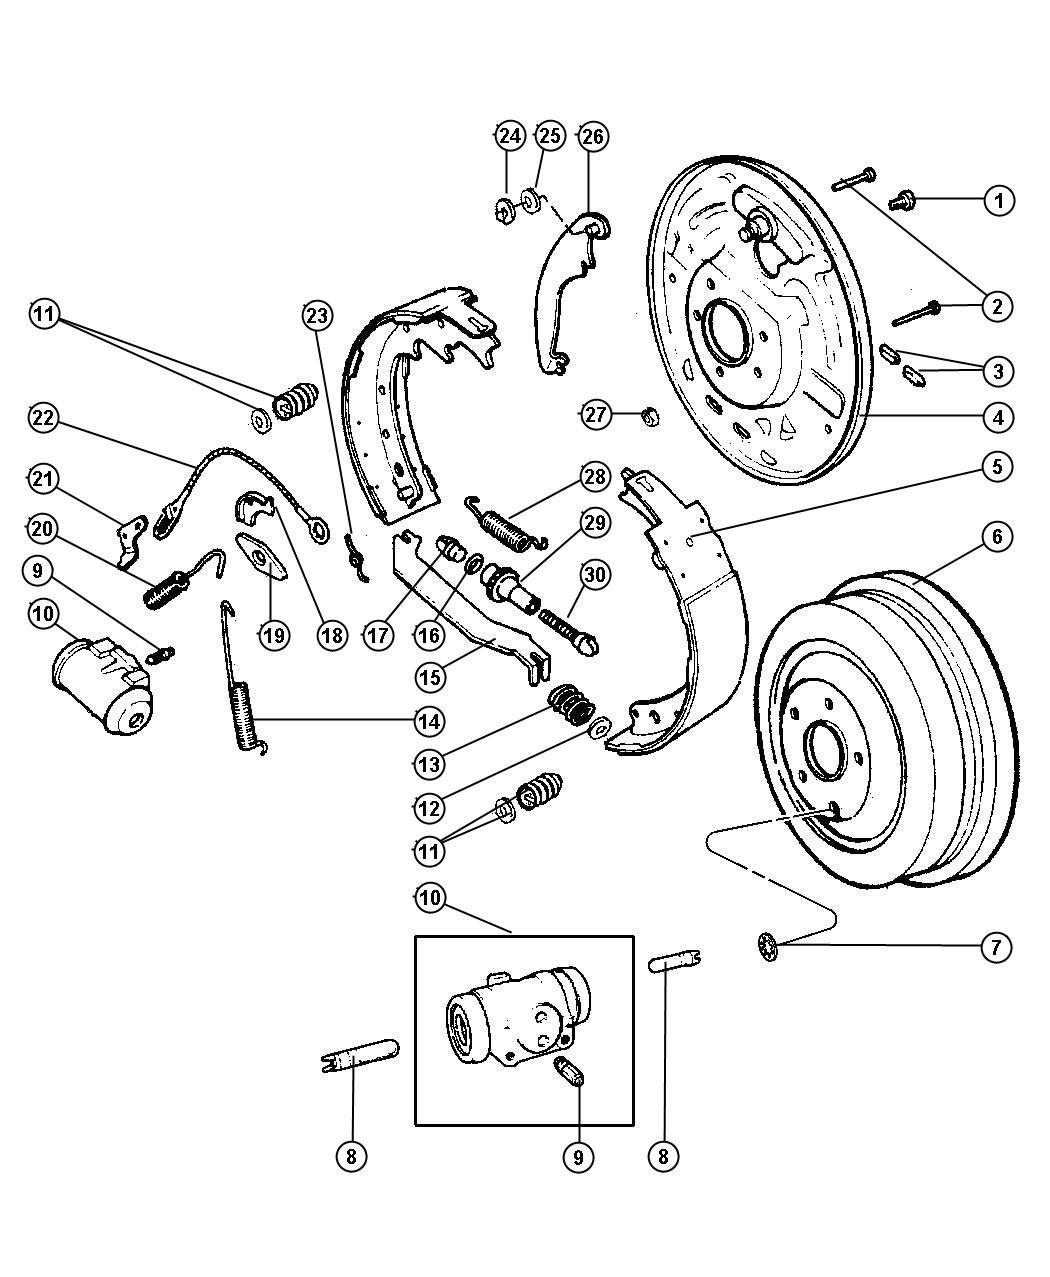 Chrysler Pt Cruiser Drum Brake Axle Rear Ratio